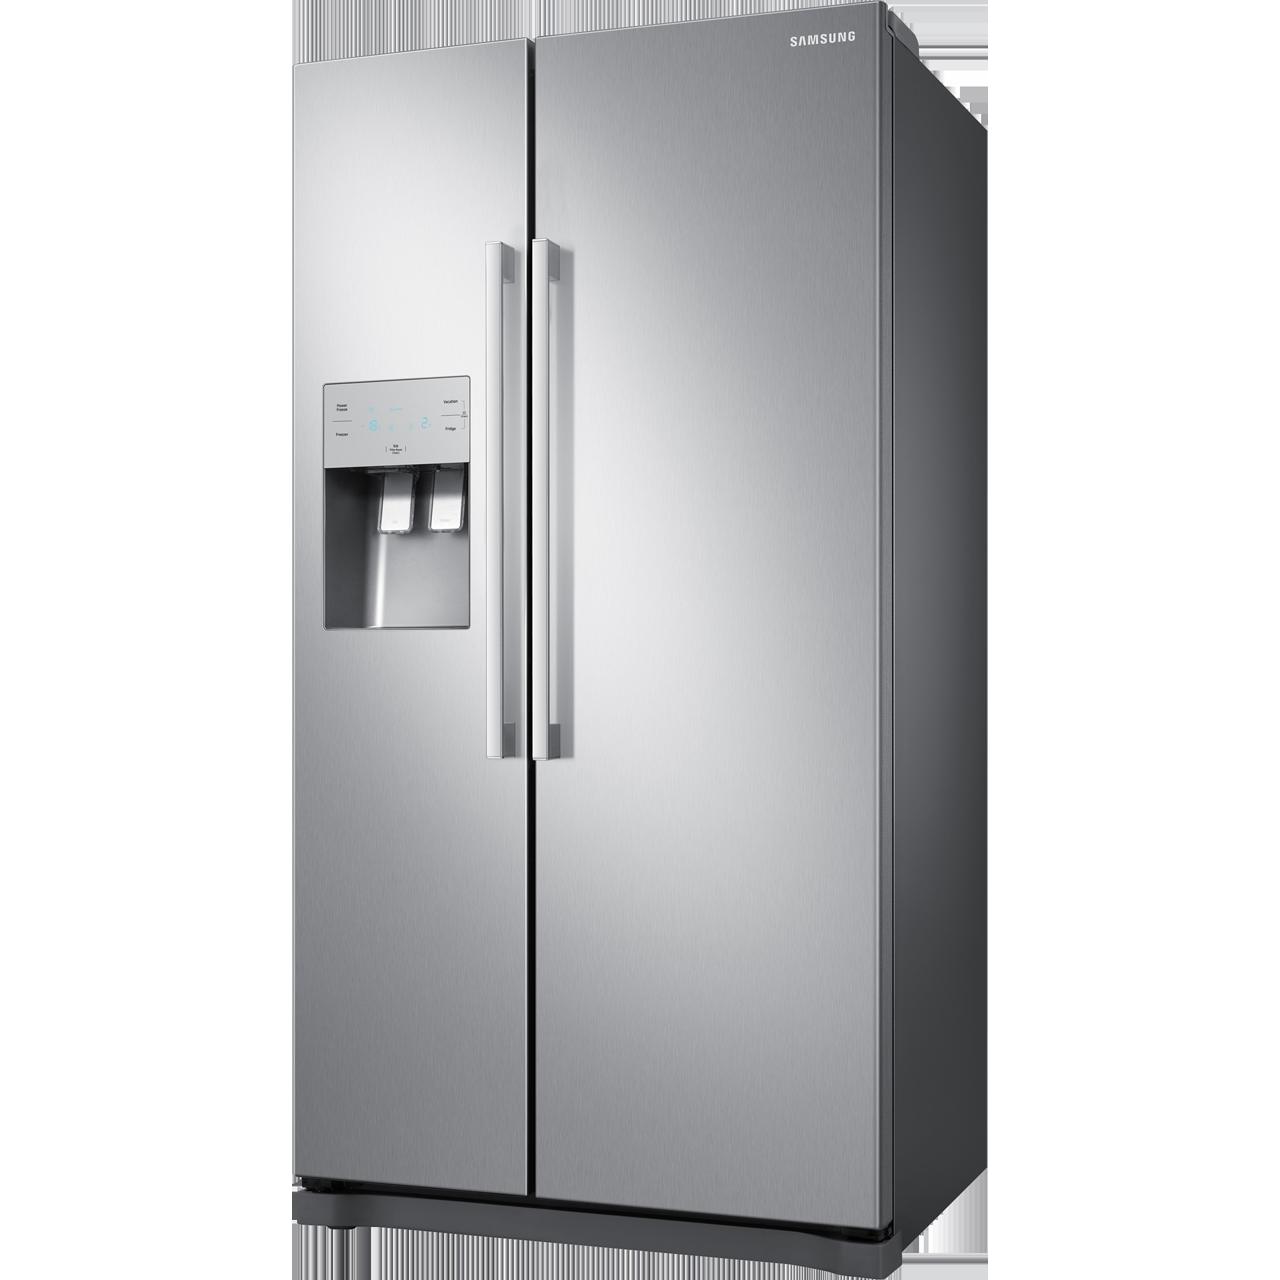 Samsung RS3000 RS50N3513SL American Fridge Freezer - Clean Steel - A+ Rated